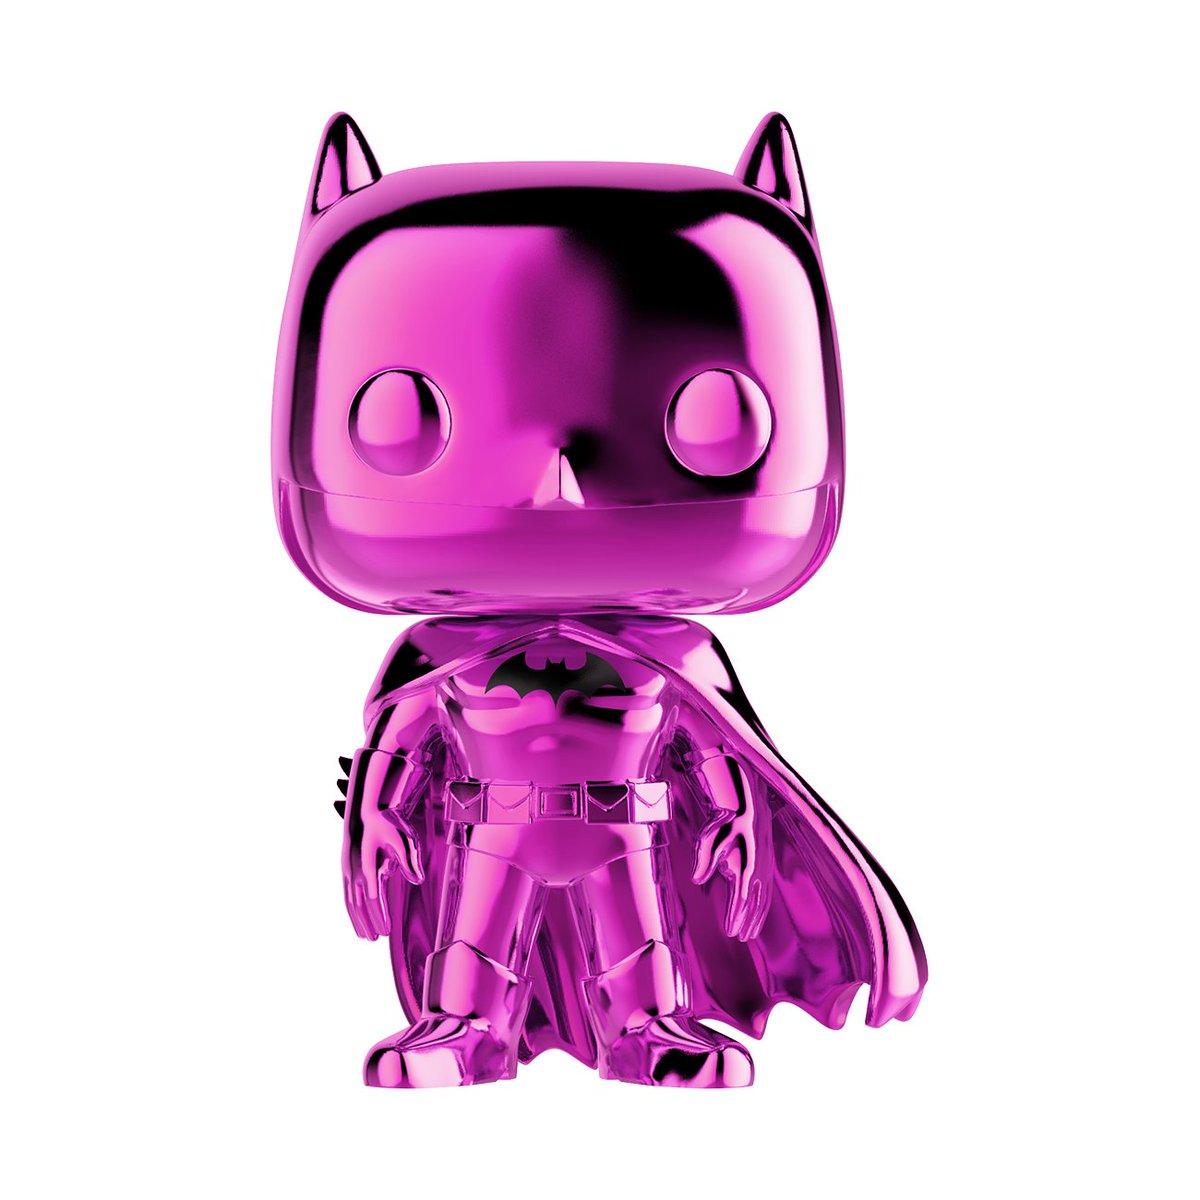 test Twitter Media - RT & follow @OriginalFunko for a chance to WIN a 2019 #NYCC exclusive Pink Chrome Batman Pop!   #Funko #Exclusive #Giveaway #FunkoNYCC #NYCC #DC #LongLivetheBat  #Batman80 https://t.co/7V0AuAnPDD